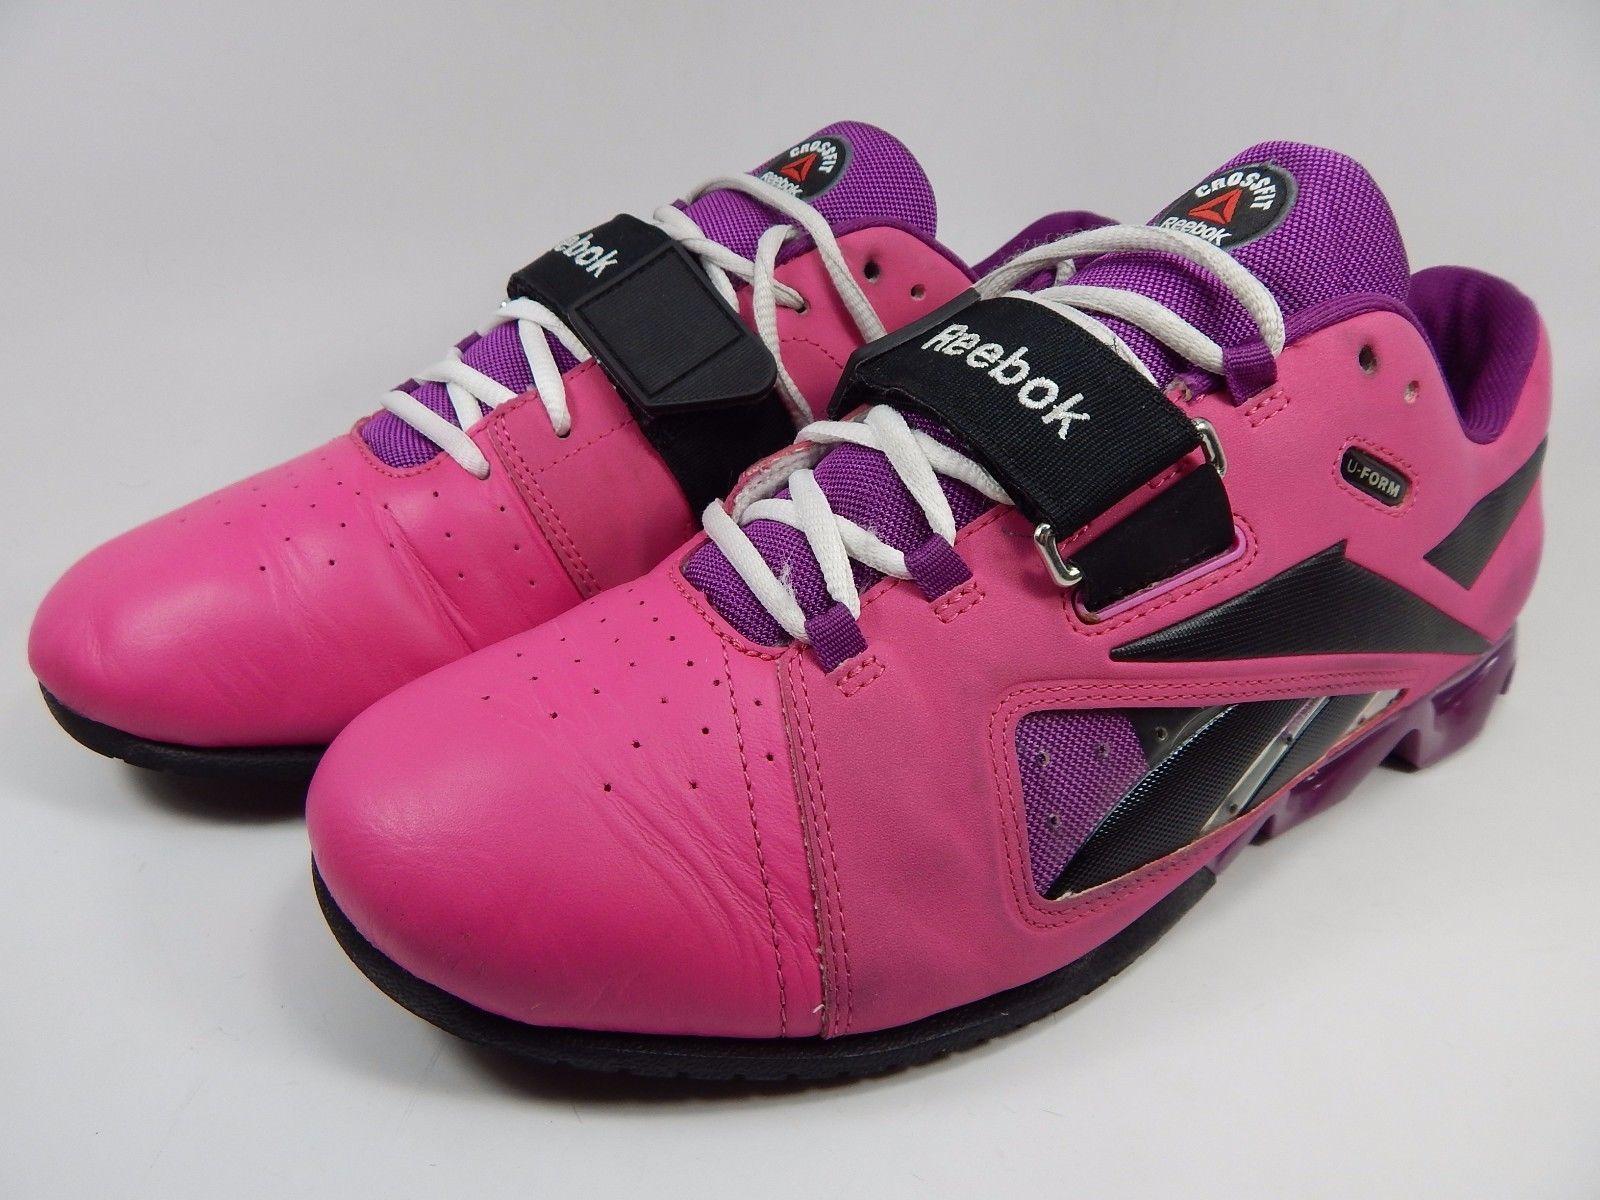 Reebok Crossfit Lifter U-Form Women's Weightlifting Shoes Size US 12 M (B) EU 44